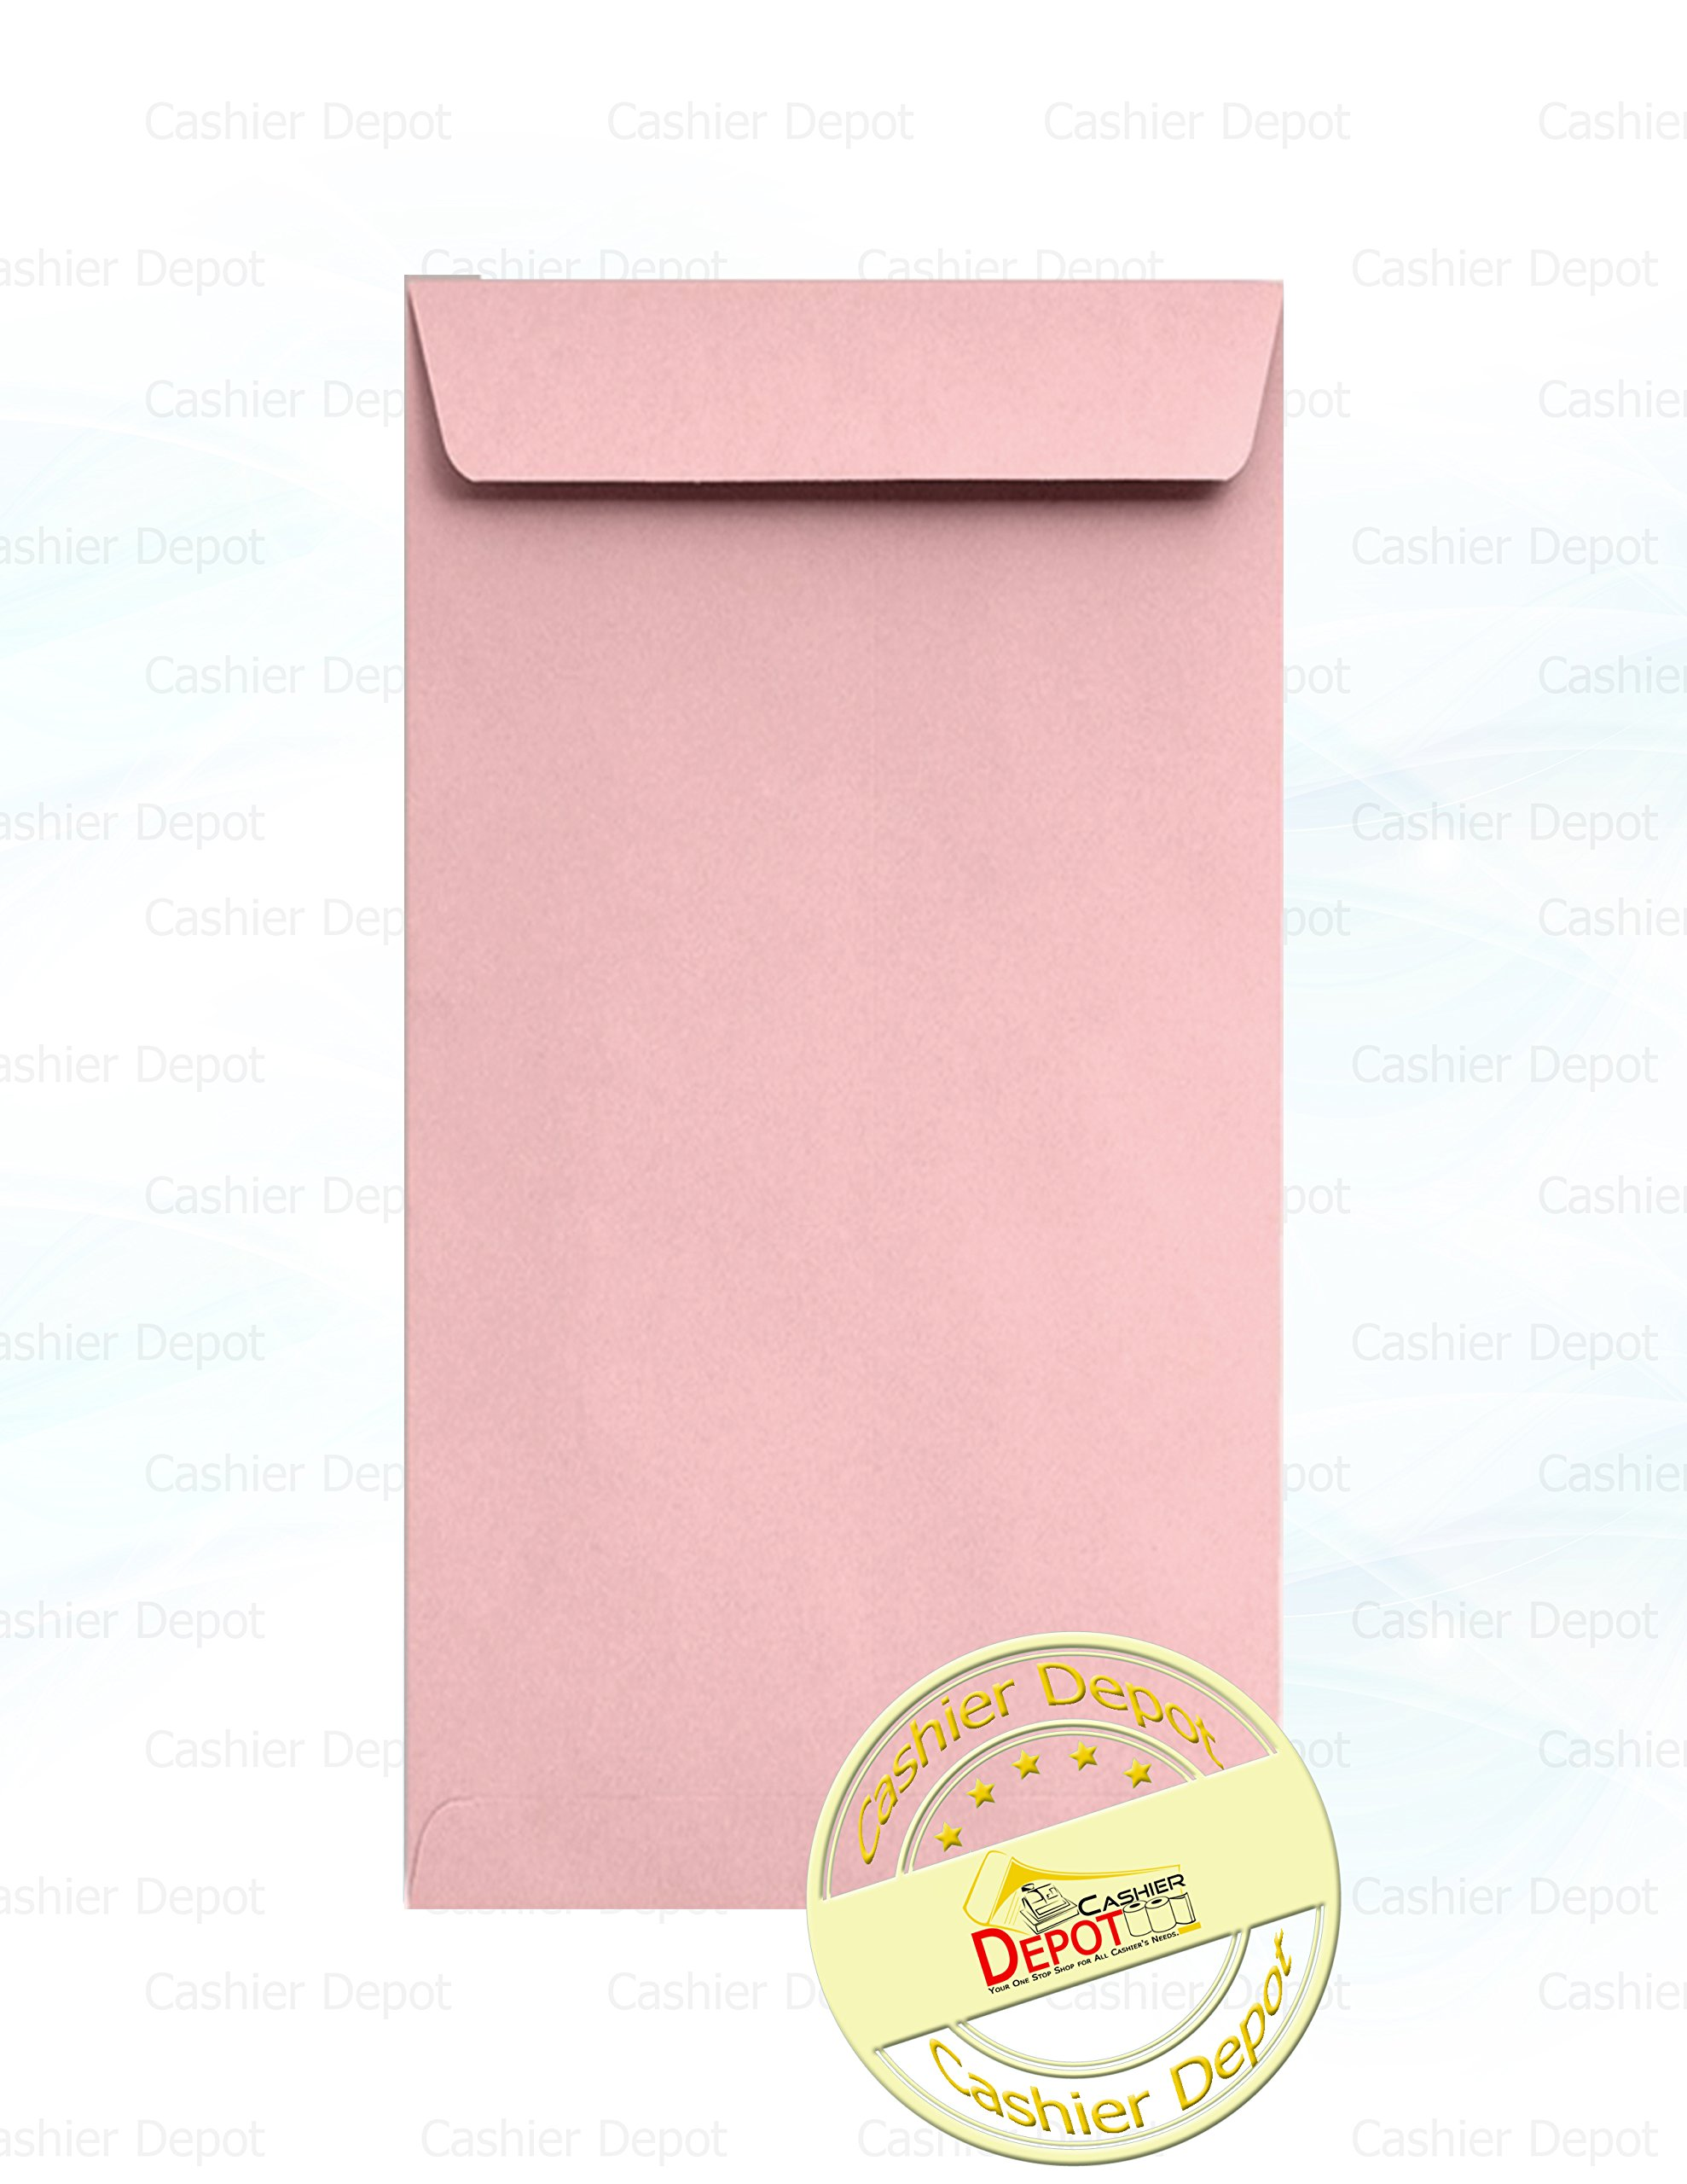 Cashier Depot #7 Coin Envelope, 3 1/2'' X 6 1/2'', 24lb, 50 Count (Pink)